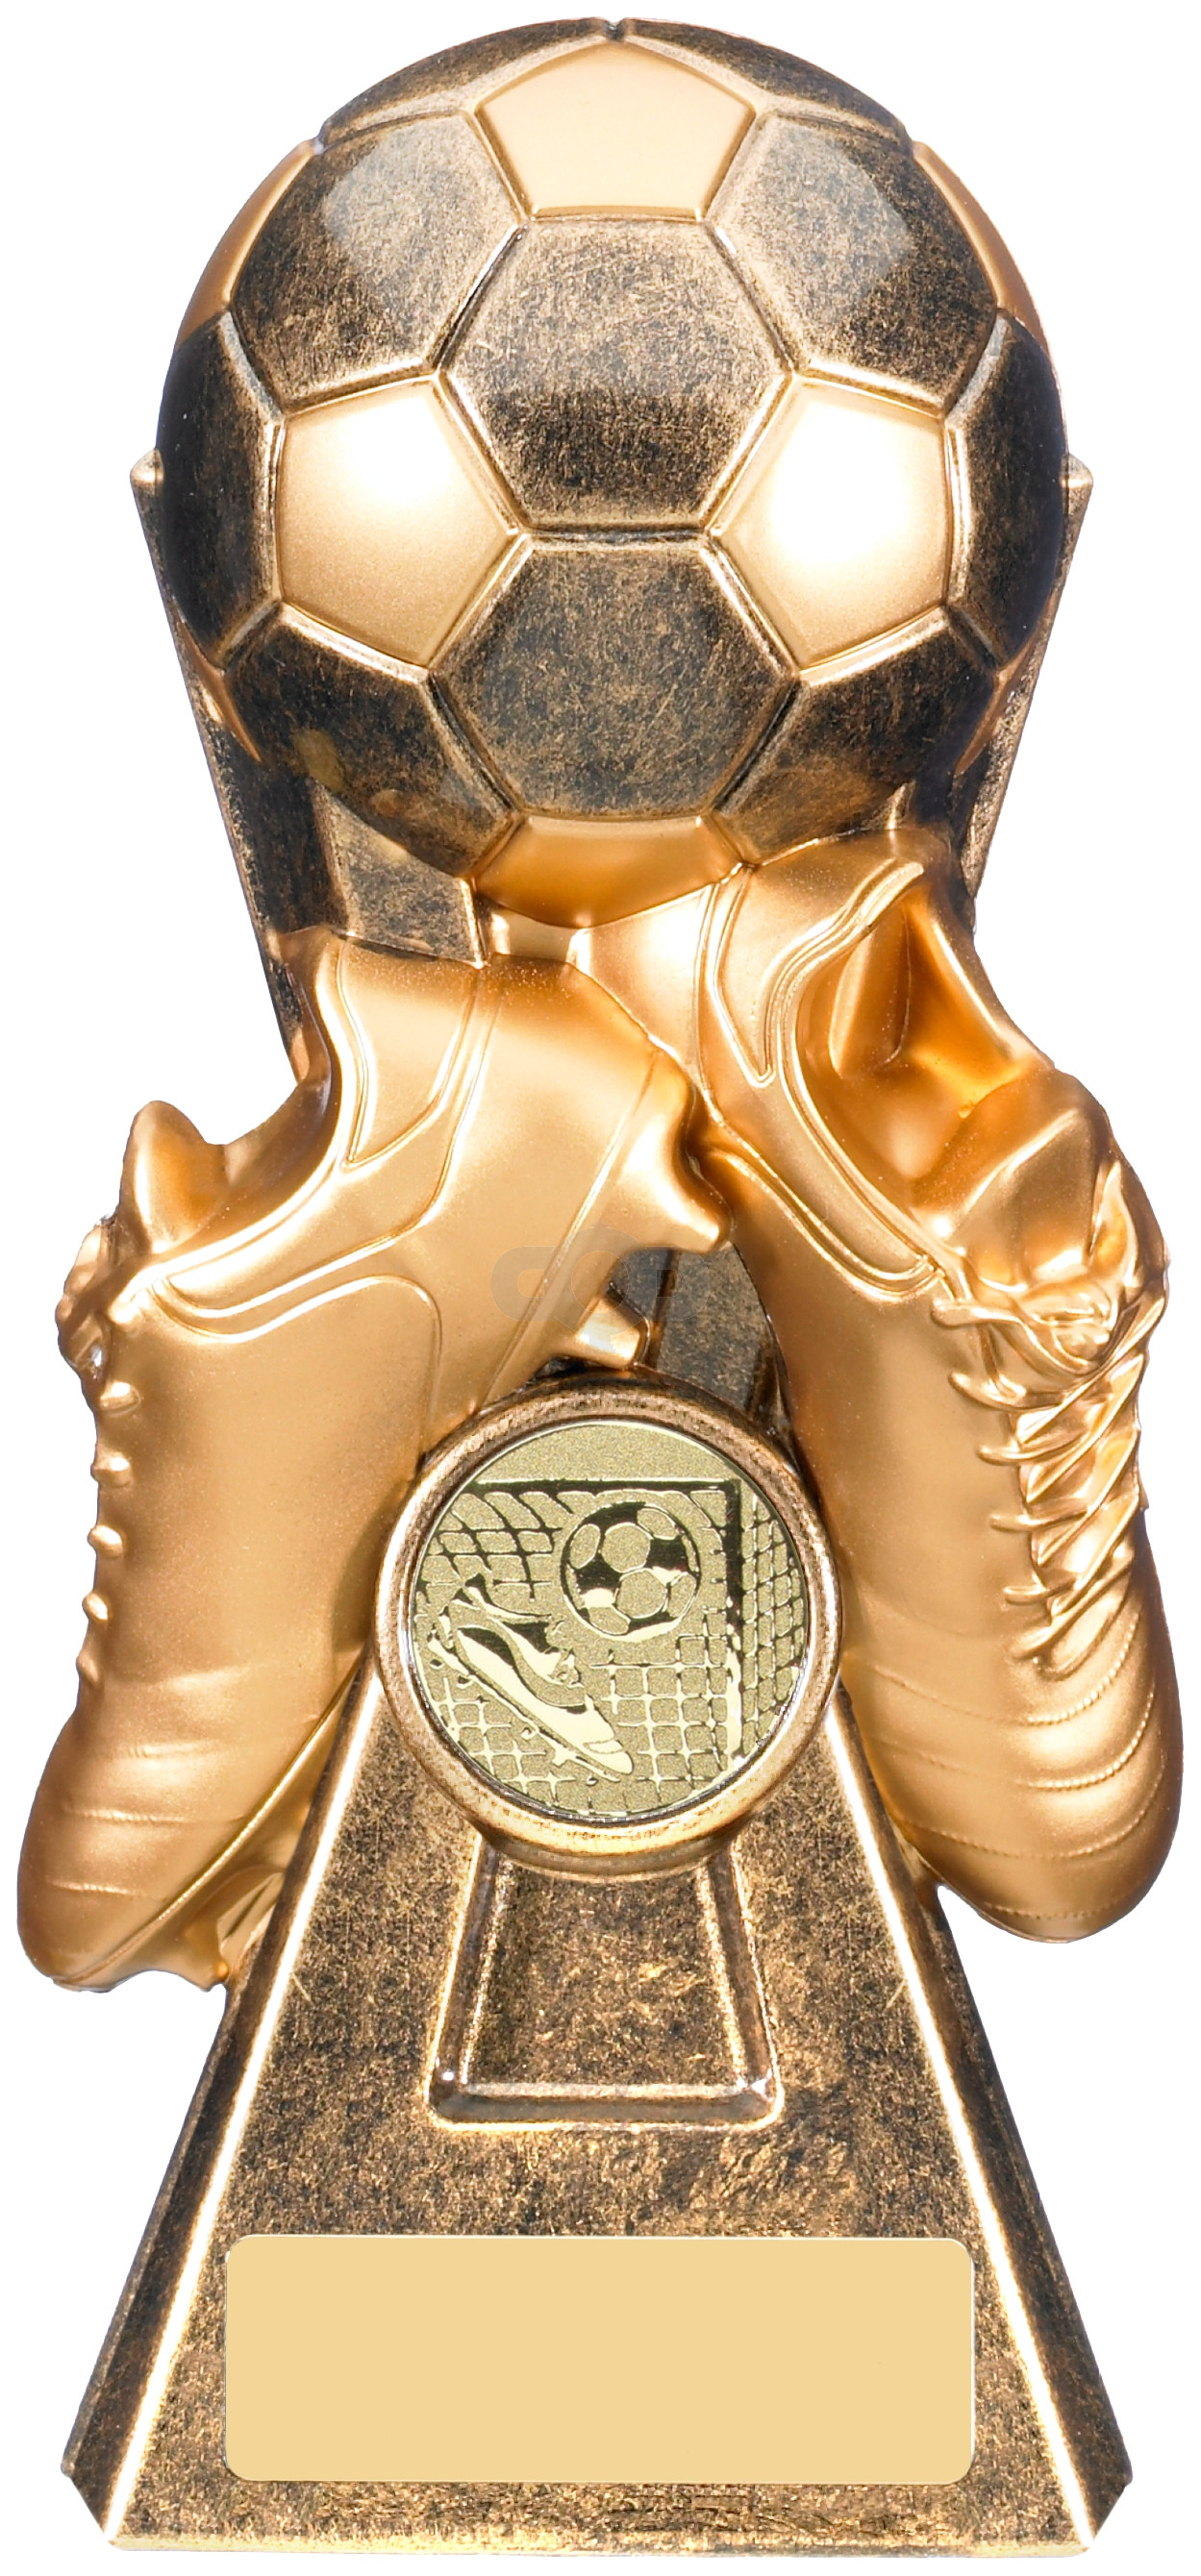 Gravity Football Trophy